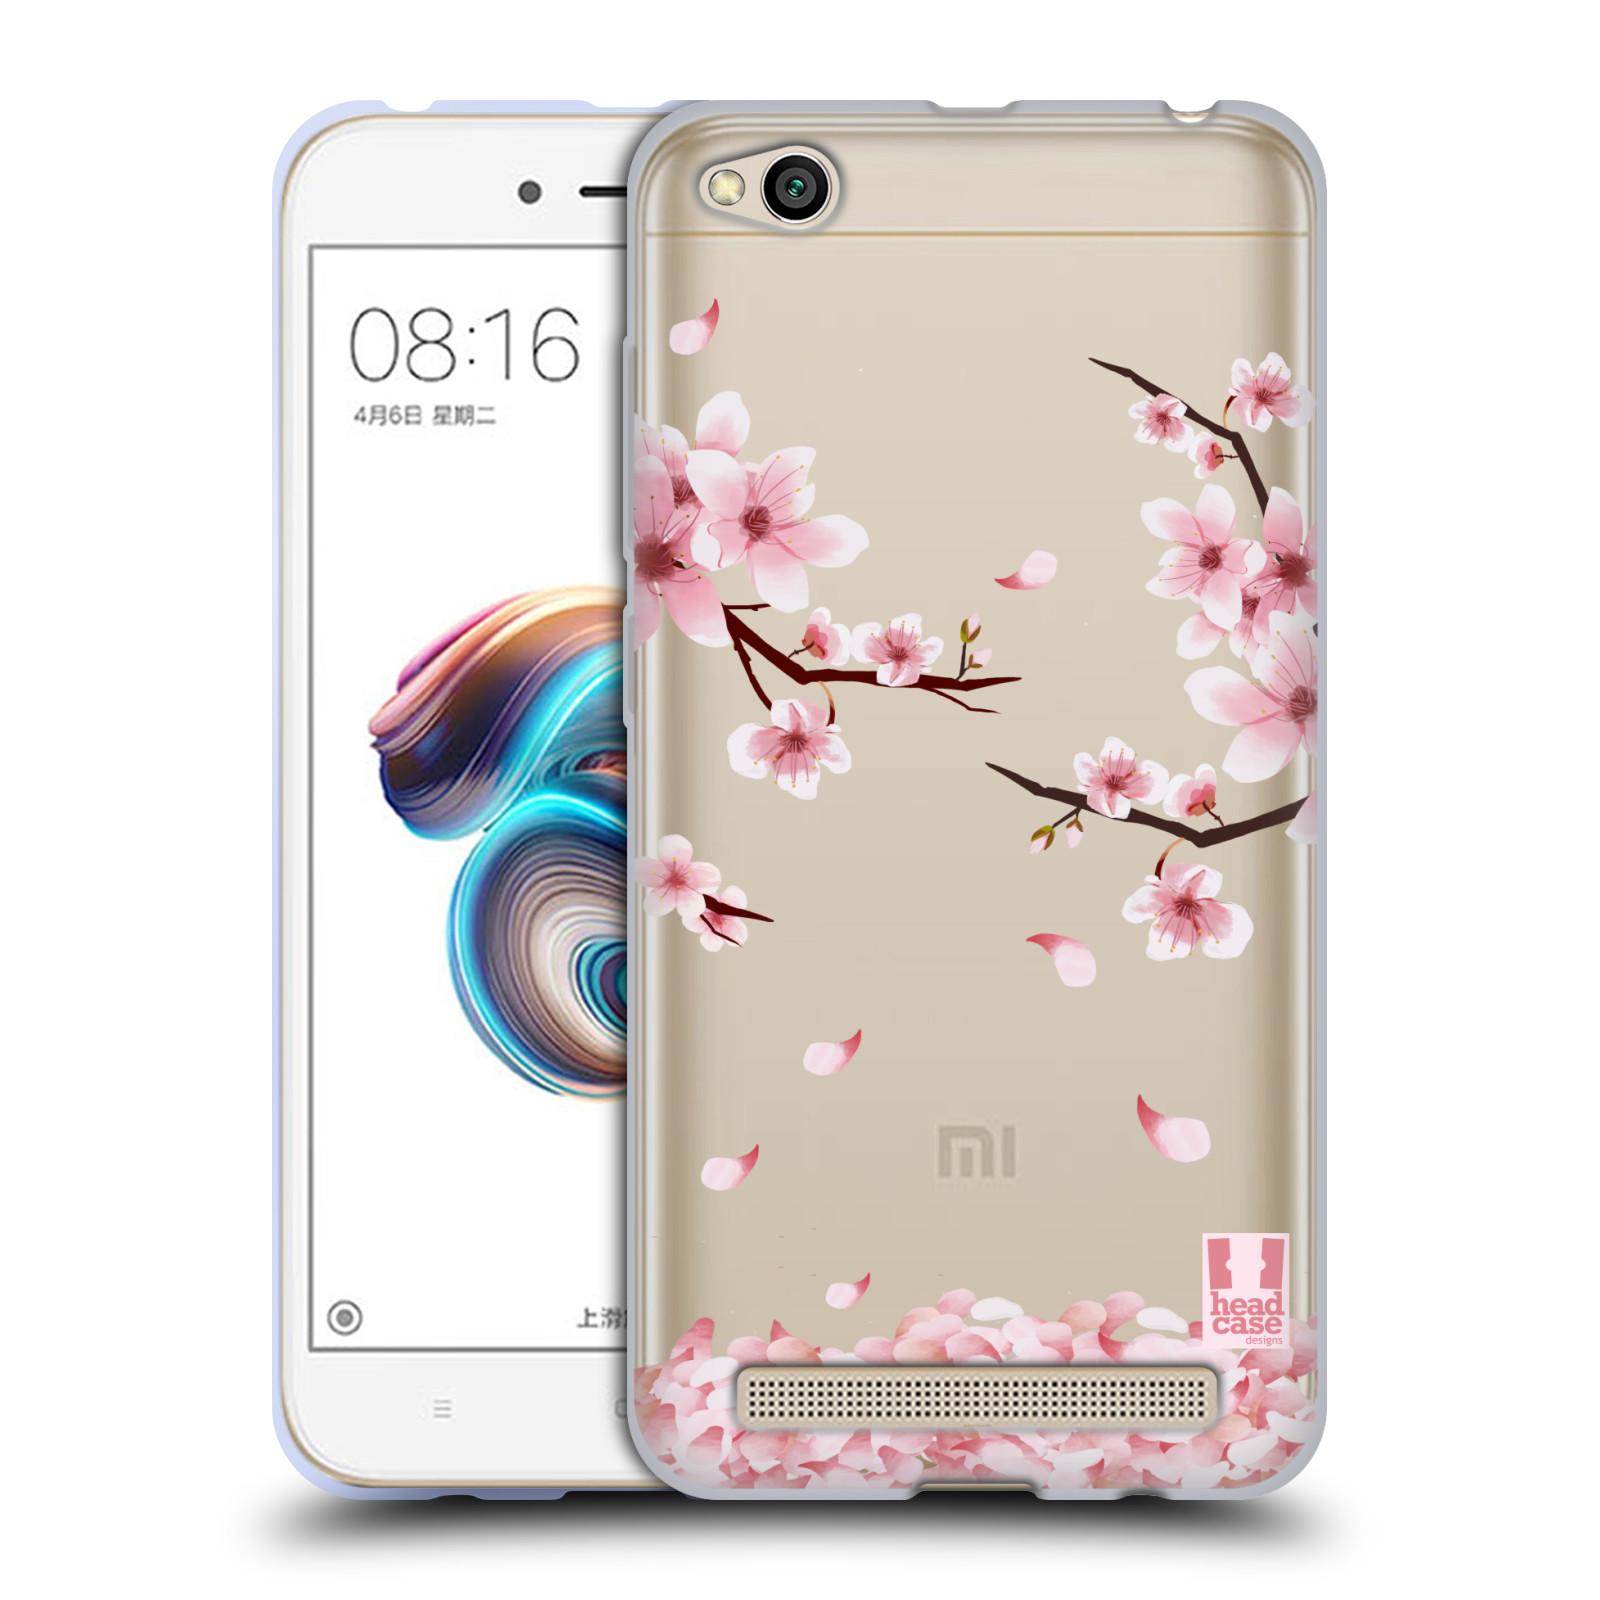 Silikonové pouzdro na mobil Xiaomi Redmi 5A - Head Case - Květy a větvičky